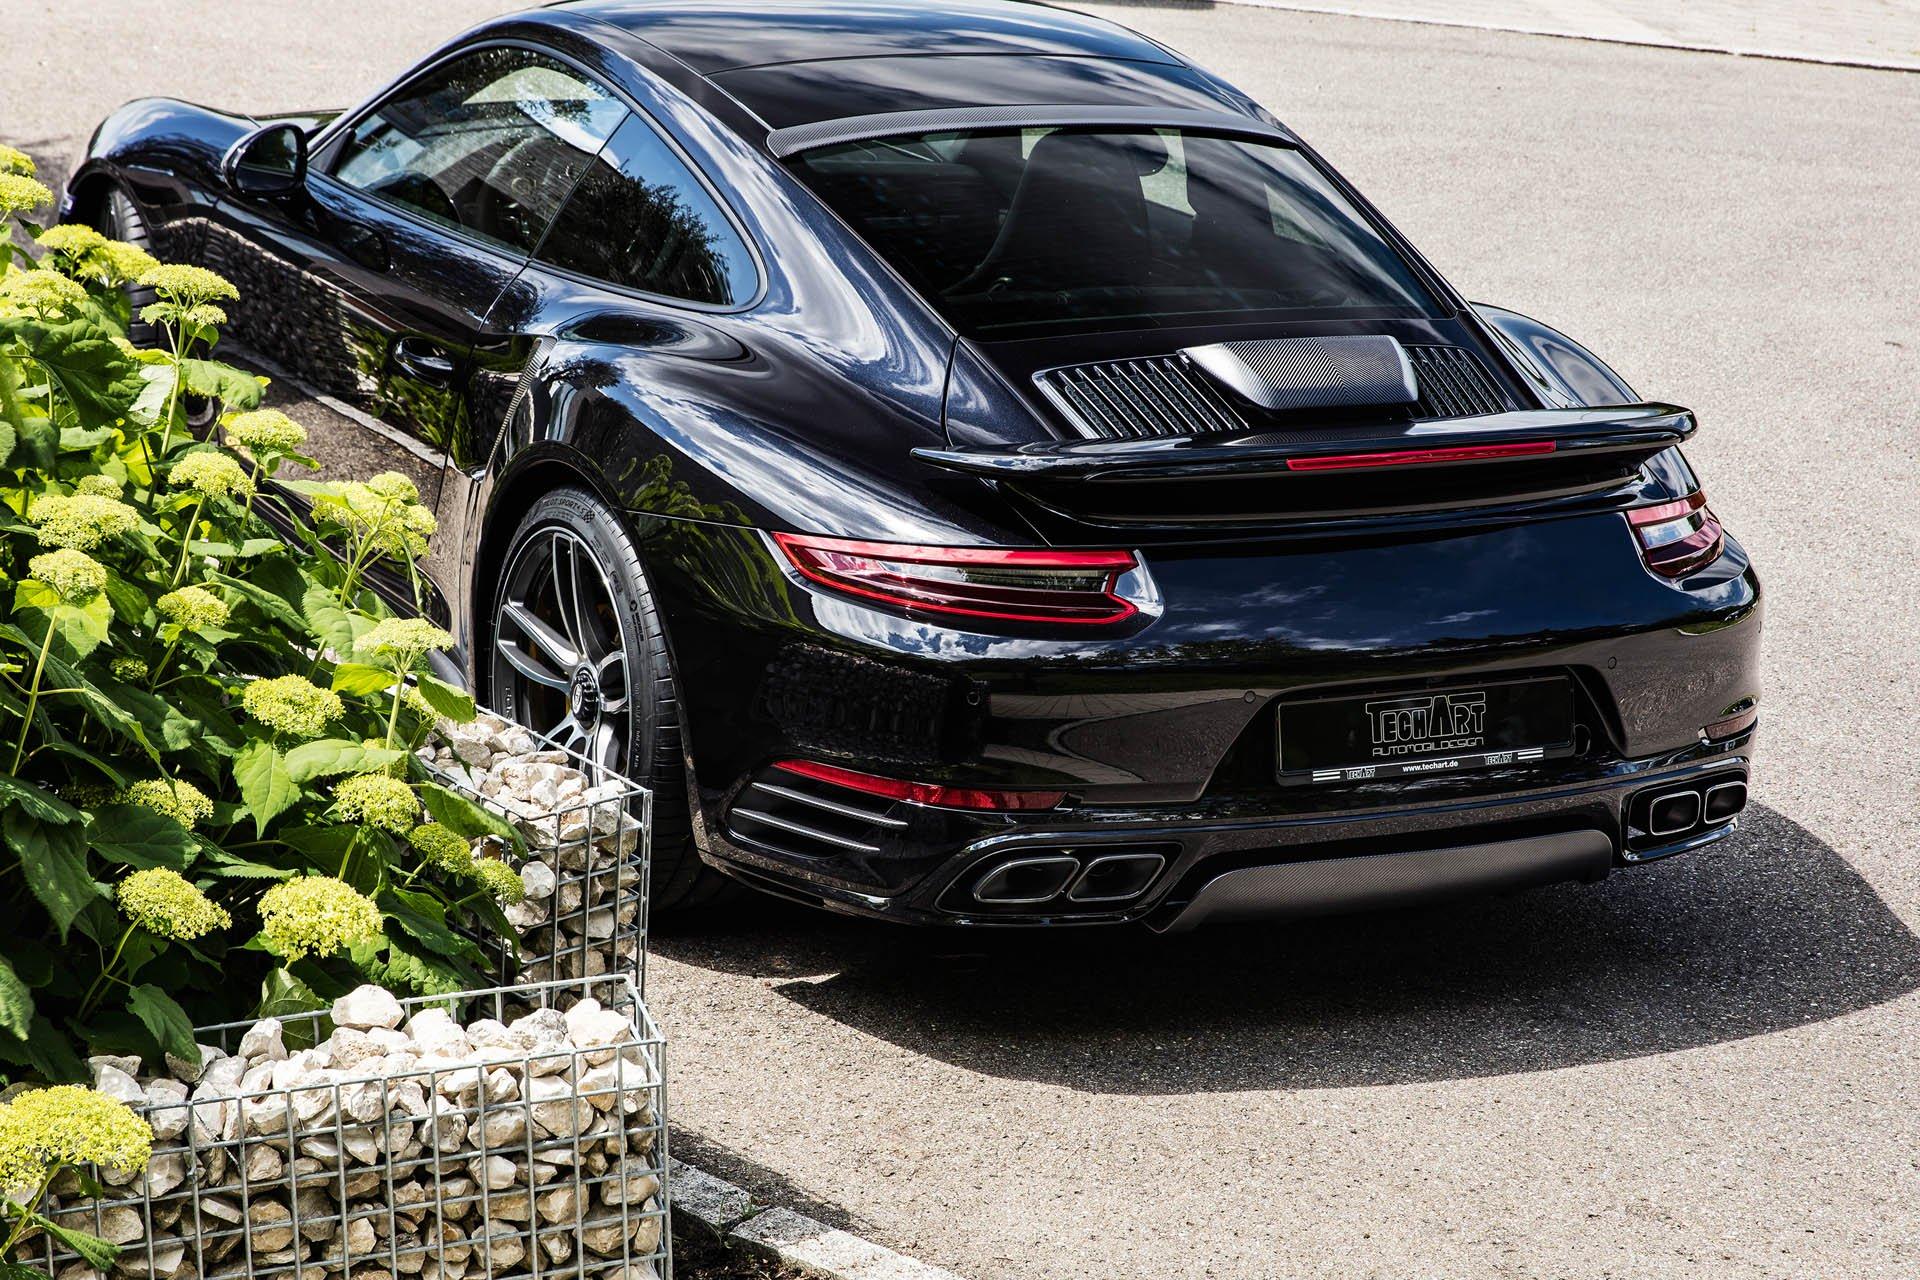 Porsche 911 Turbo S by TechArt (7)